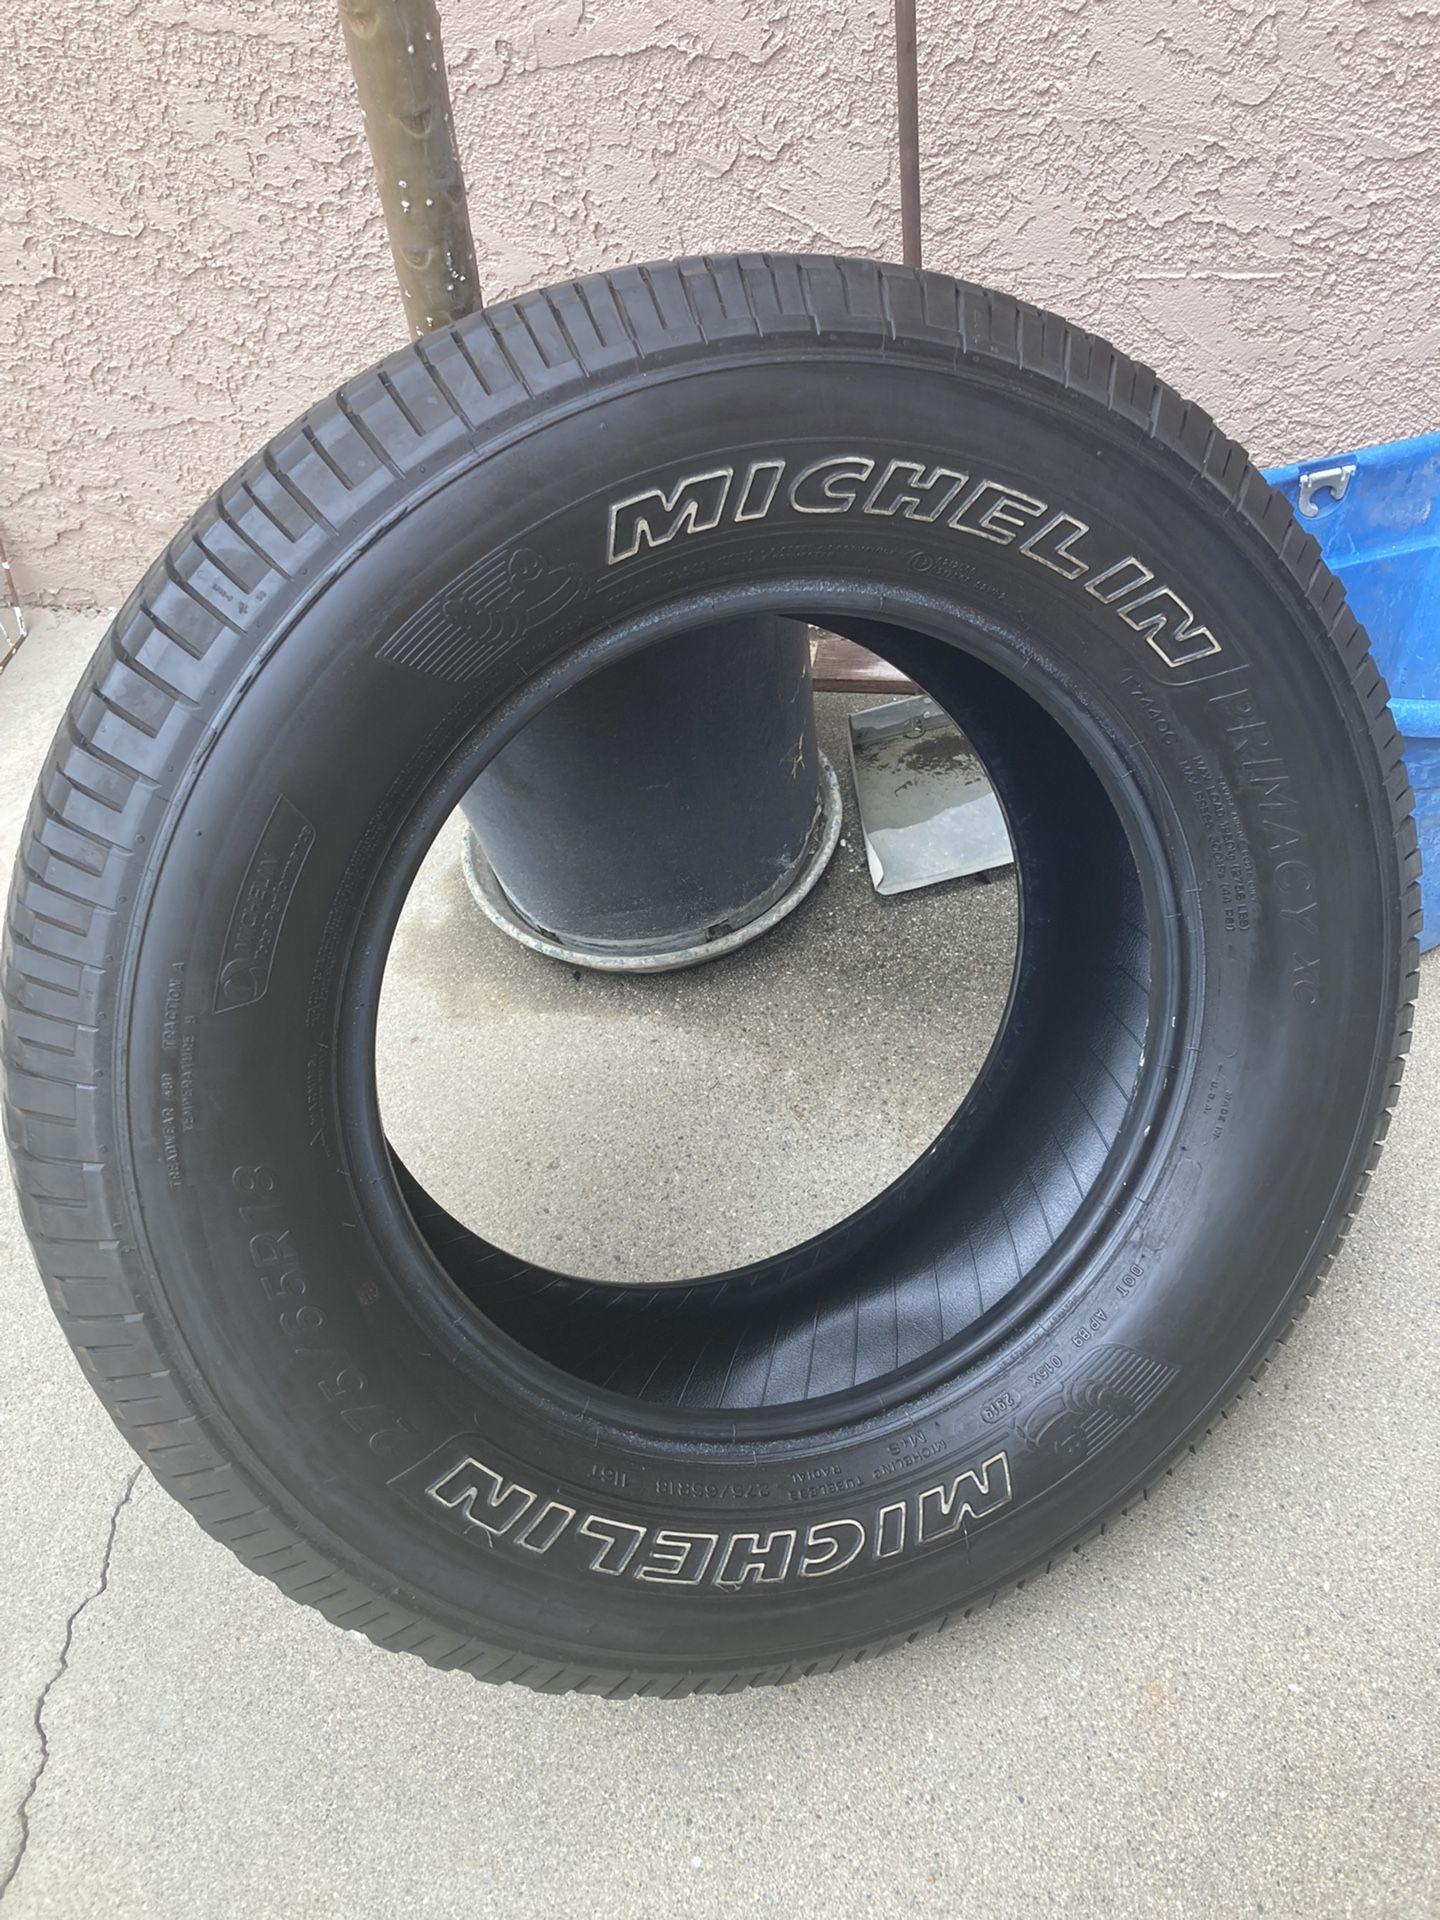 (2) 275/65/18 Michelin Tires 70% Thread Left